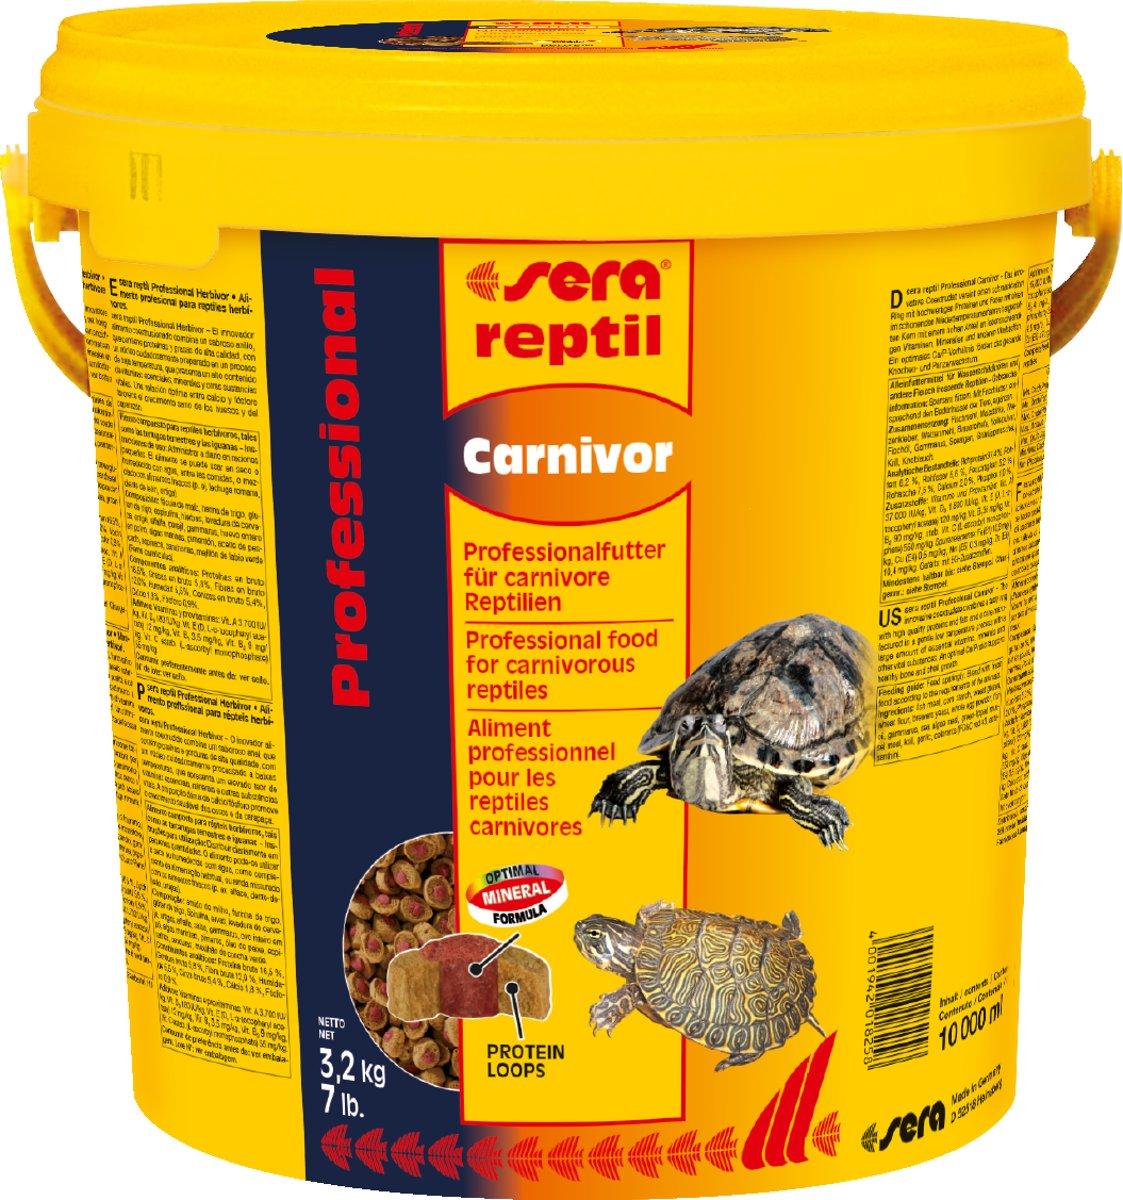 Sera reptil professional Carnivor 10 liter kopen